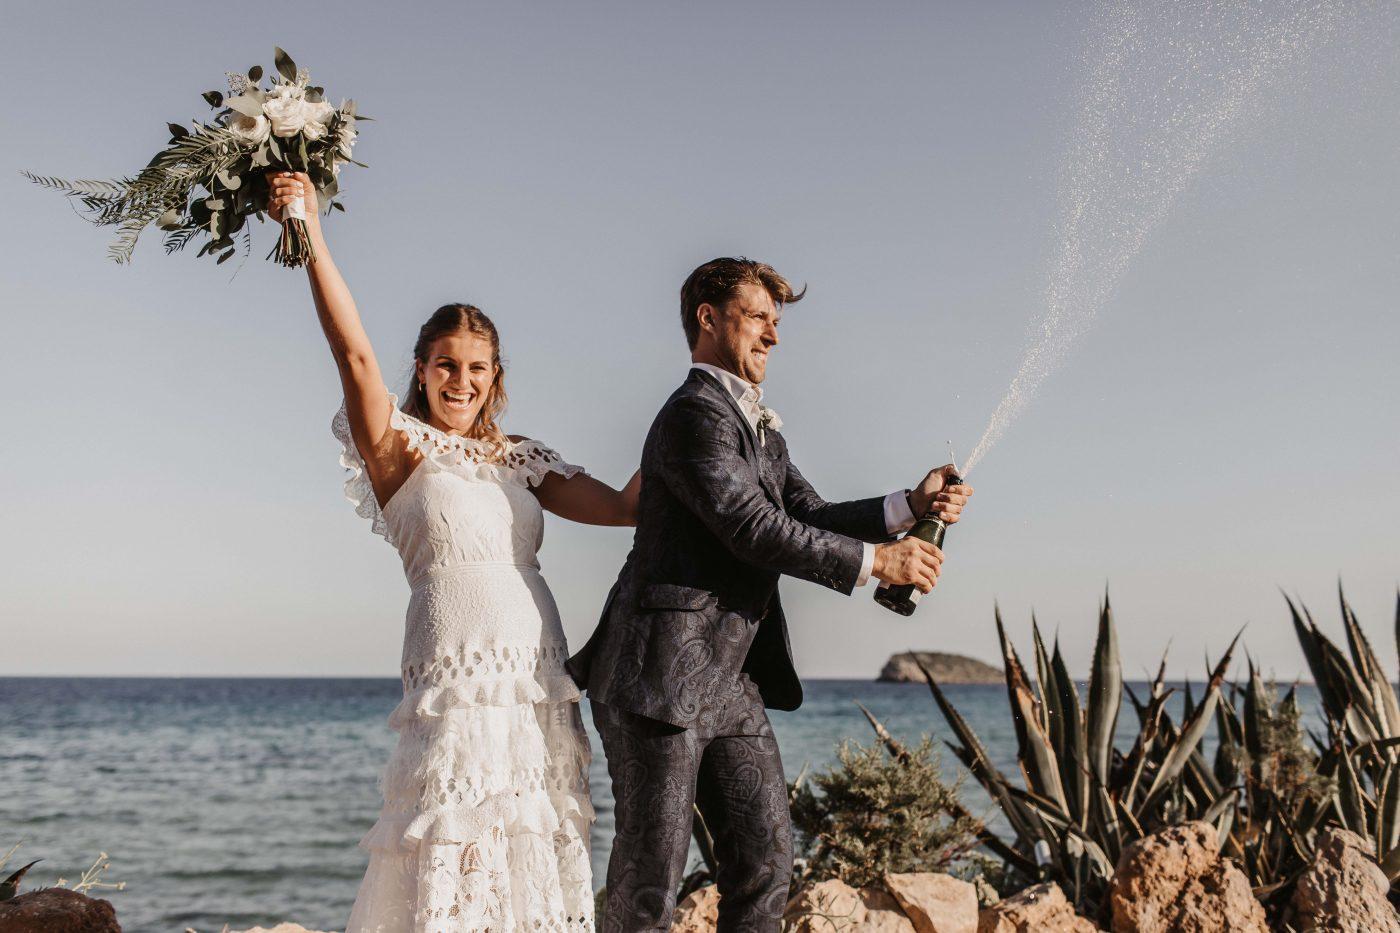 "Venue <a href=""https://www.wedinspire.com/wedding-venues/ibiza/aiyanna-ibiza/"" target=""_blank"" rel=""noopener noreferrer"">Aiyanna Ibiza</a>    Photo by <a href=""https://www.natashamarshallphotography.com/"" target=""_blank"" rel=""noopener noreferrer"">Natasha Marshall Photography</a>"